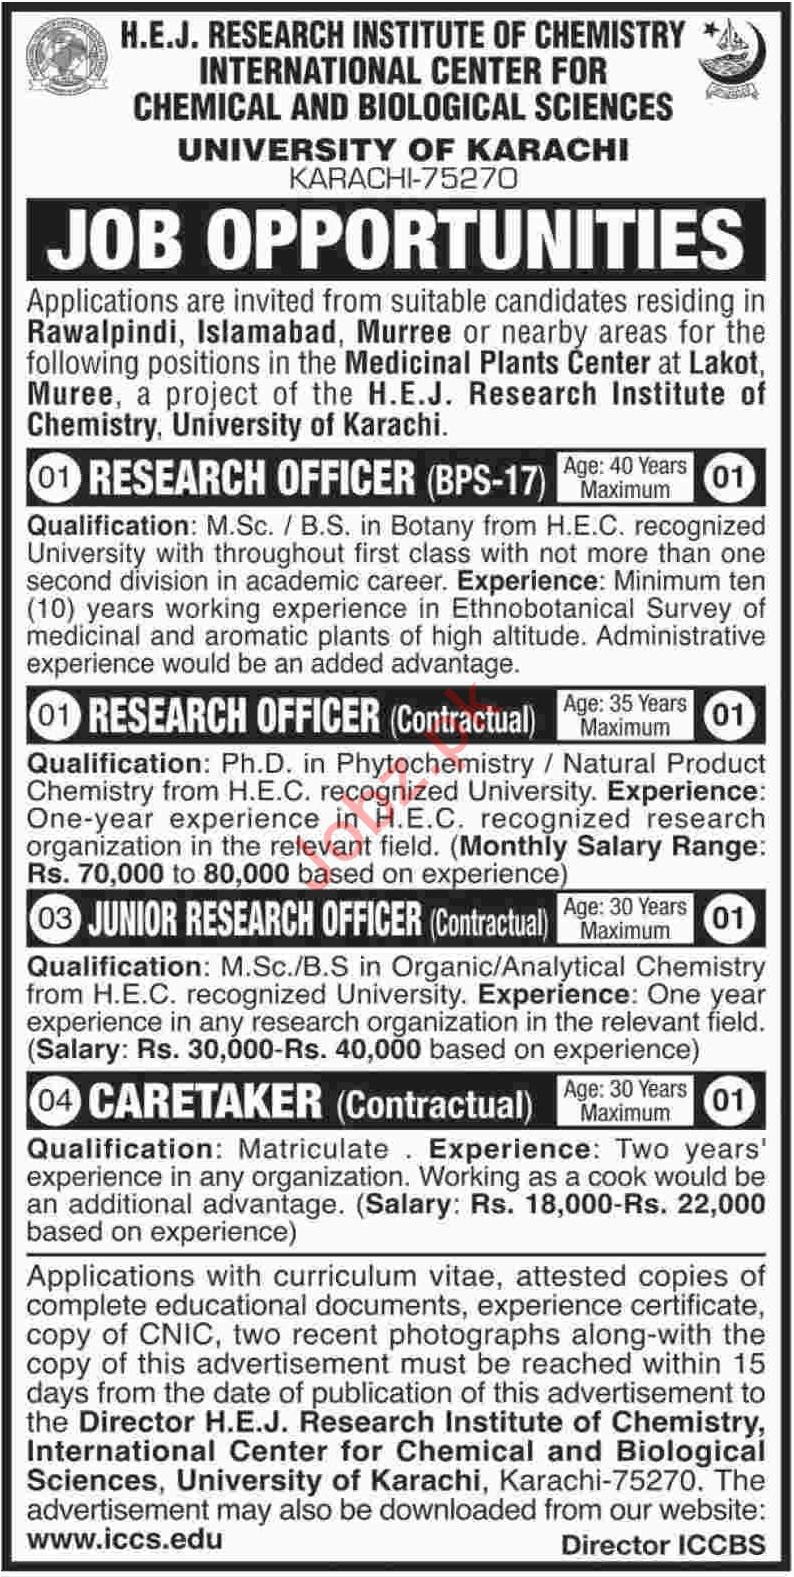 University of Karachi Vacancies